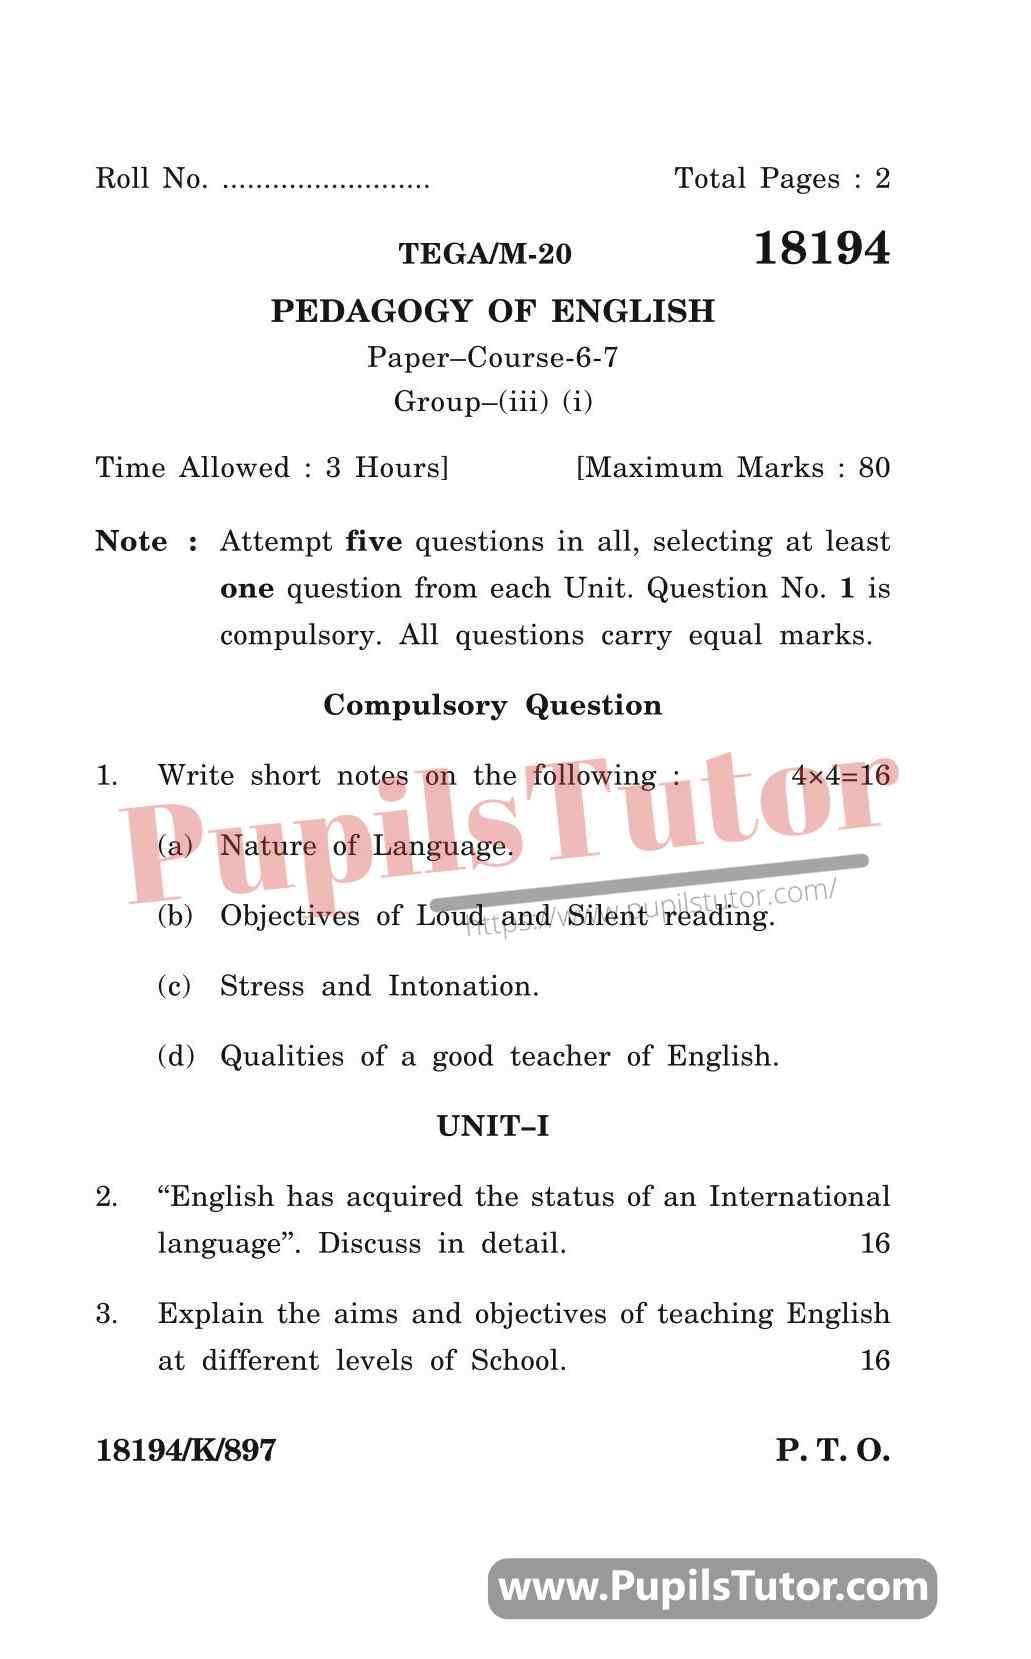 KUK (Kurukshetra University, Haryana) Pedagogy Of English Question Paper 2020 For B.Ed 1st And 2nd Year And All The 4 Semesters Free Download PDF - Page 1 - Pupils Tutor